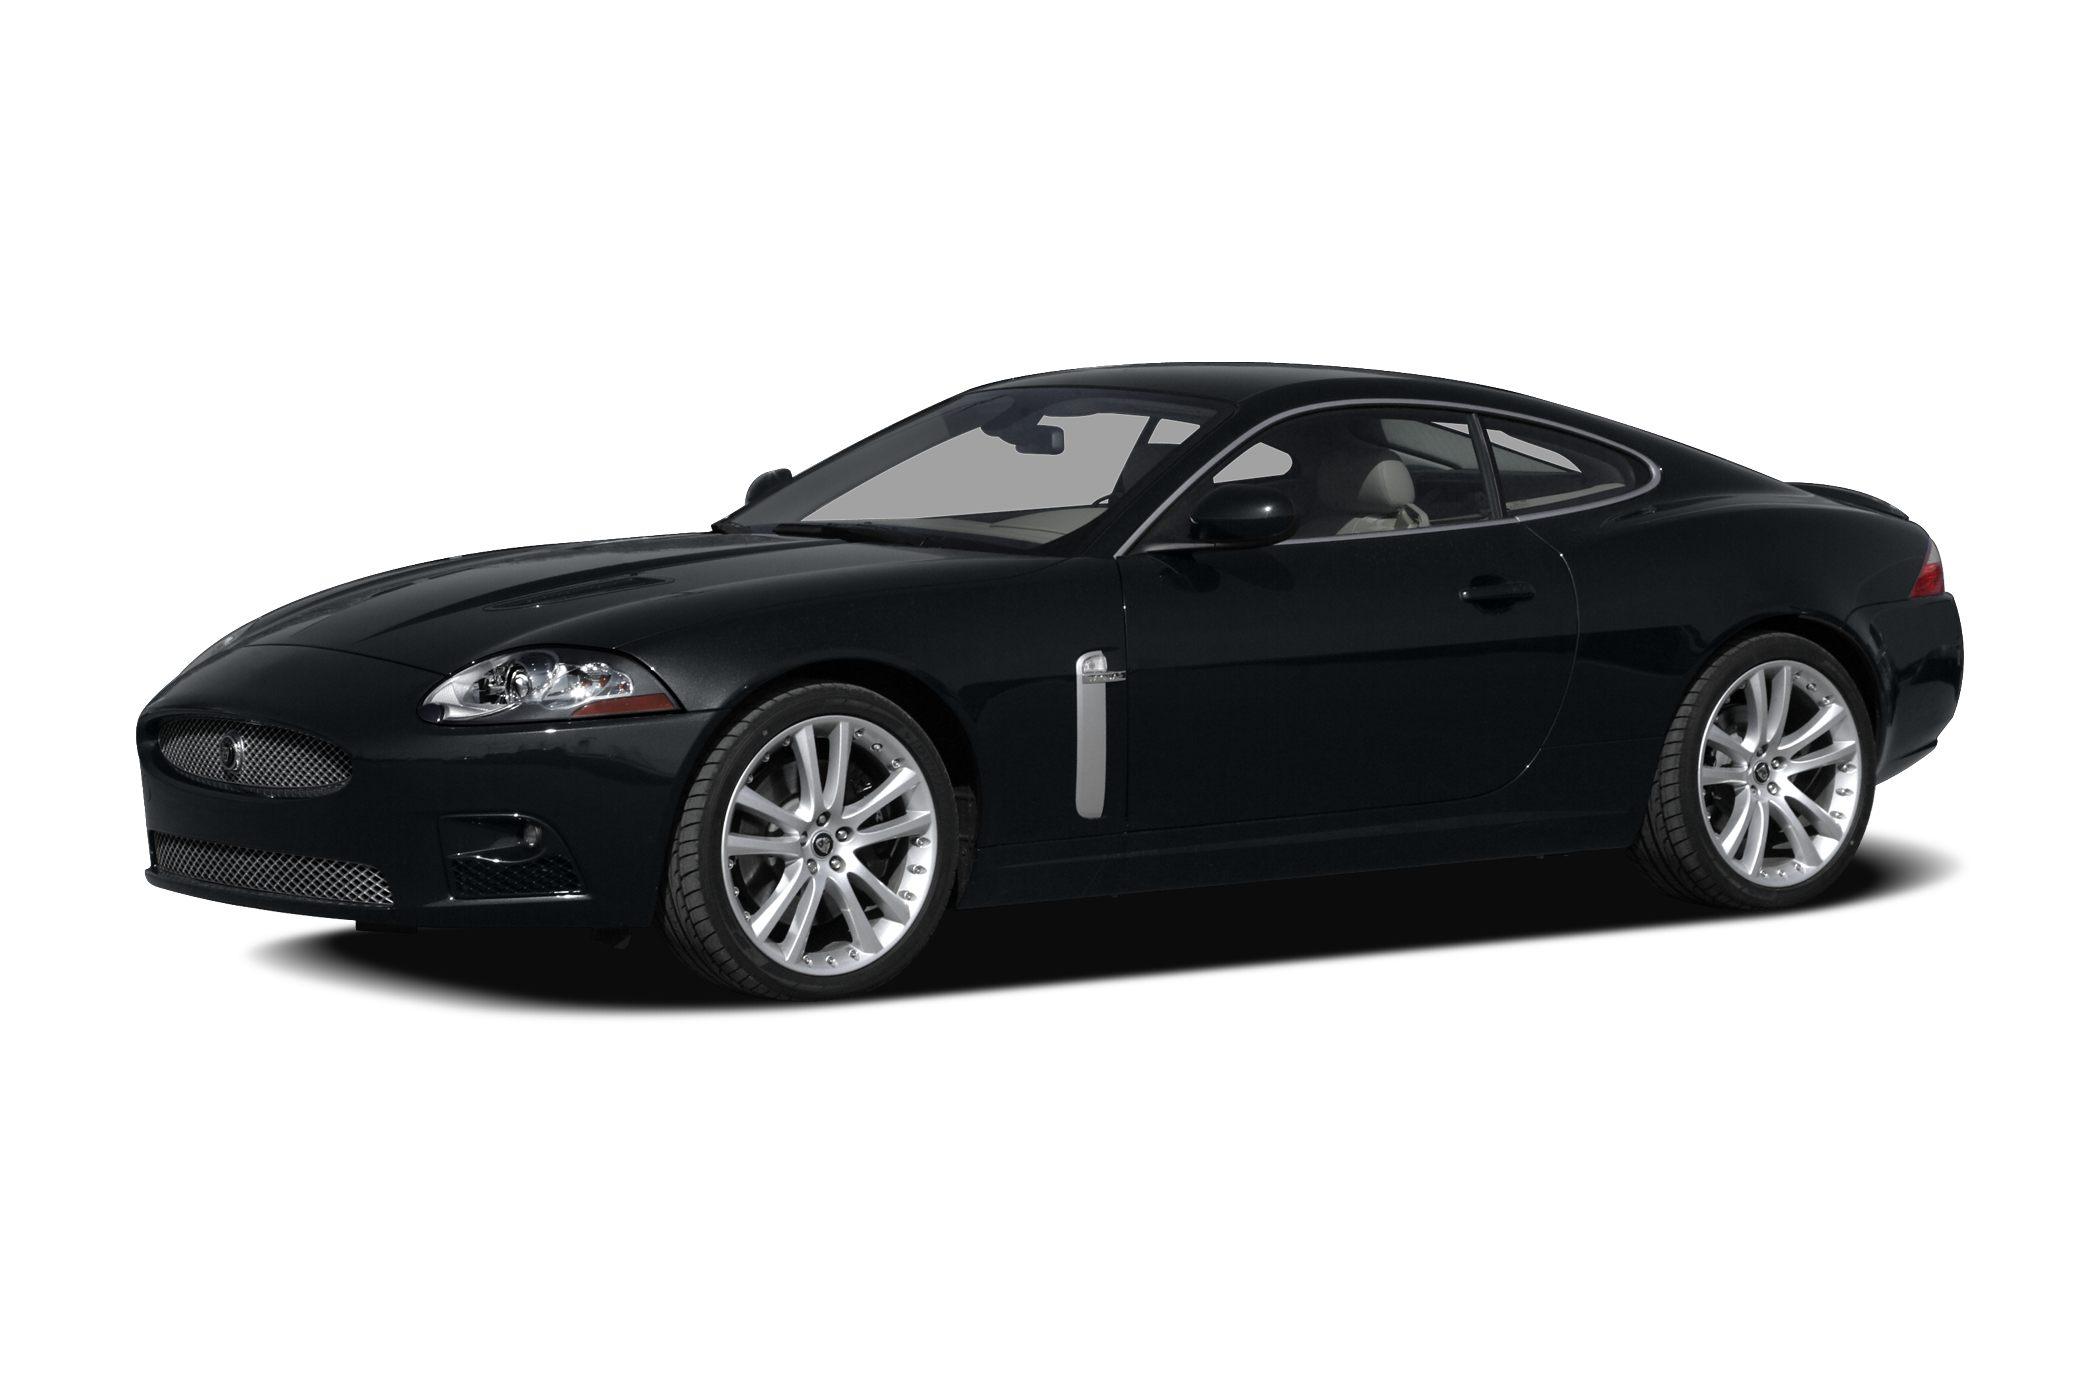 jaguar price reviews wheel type f rear base features photo convertible photos drive